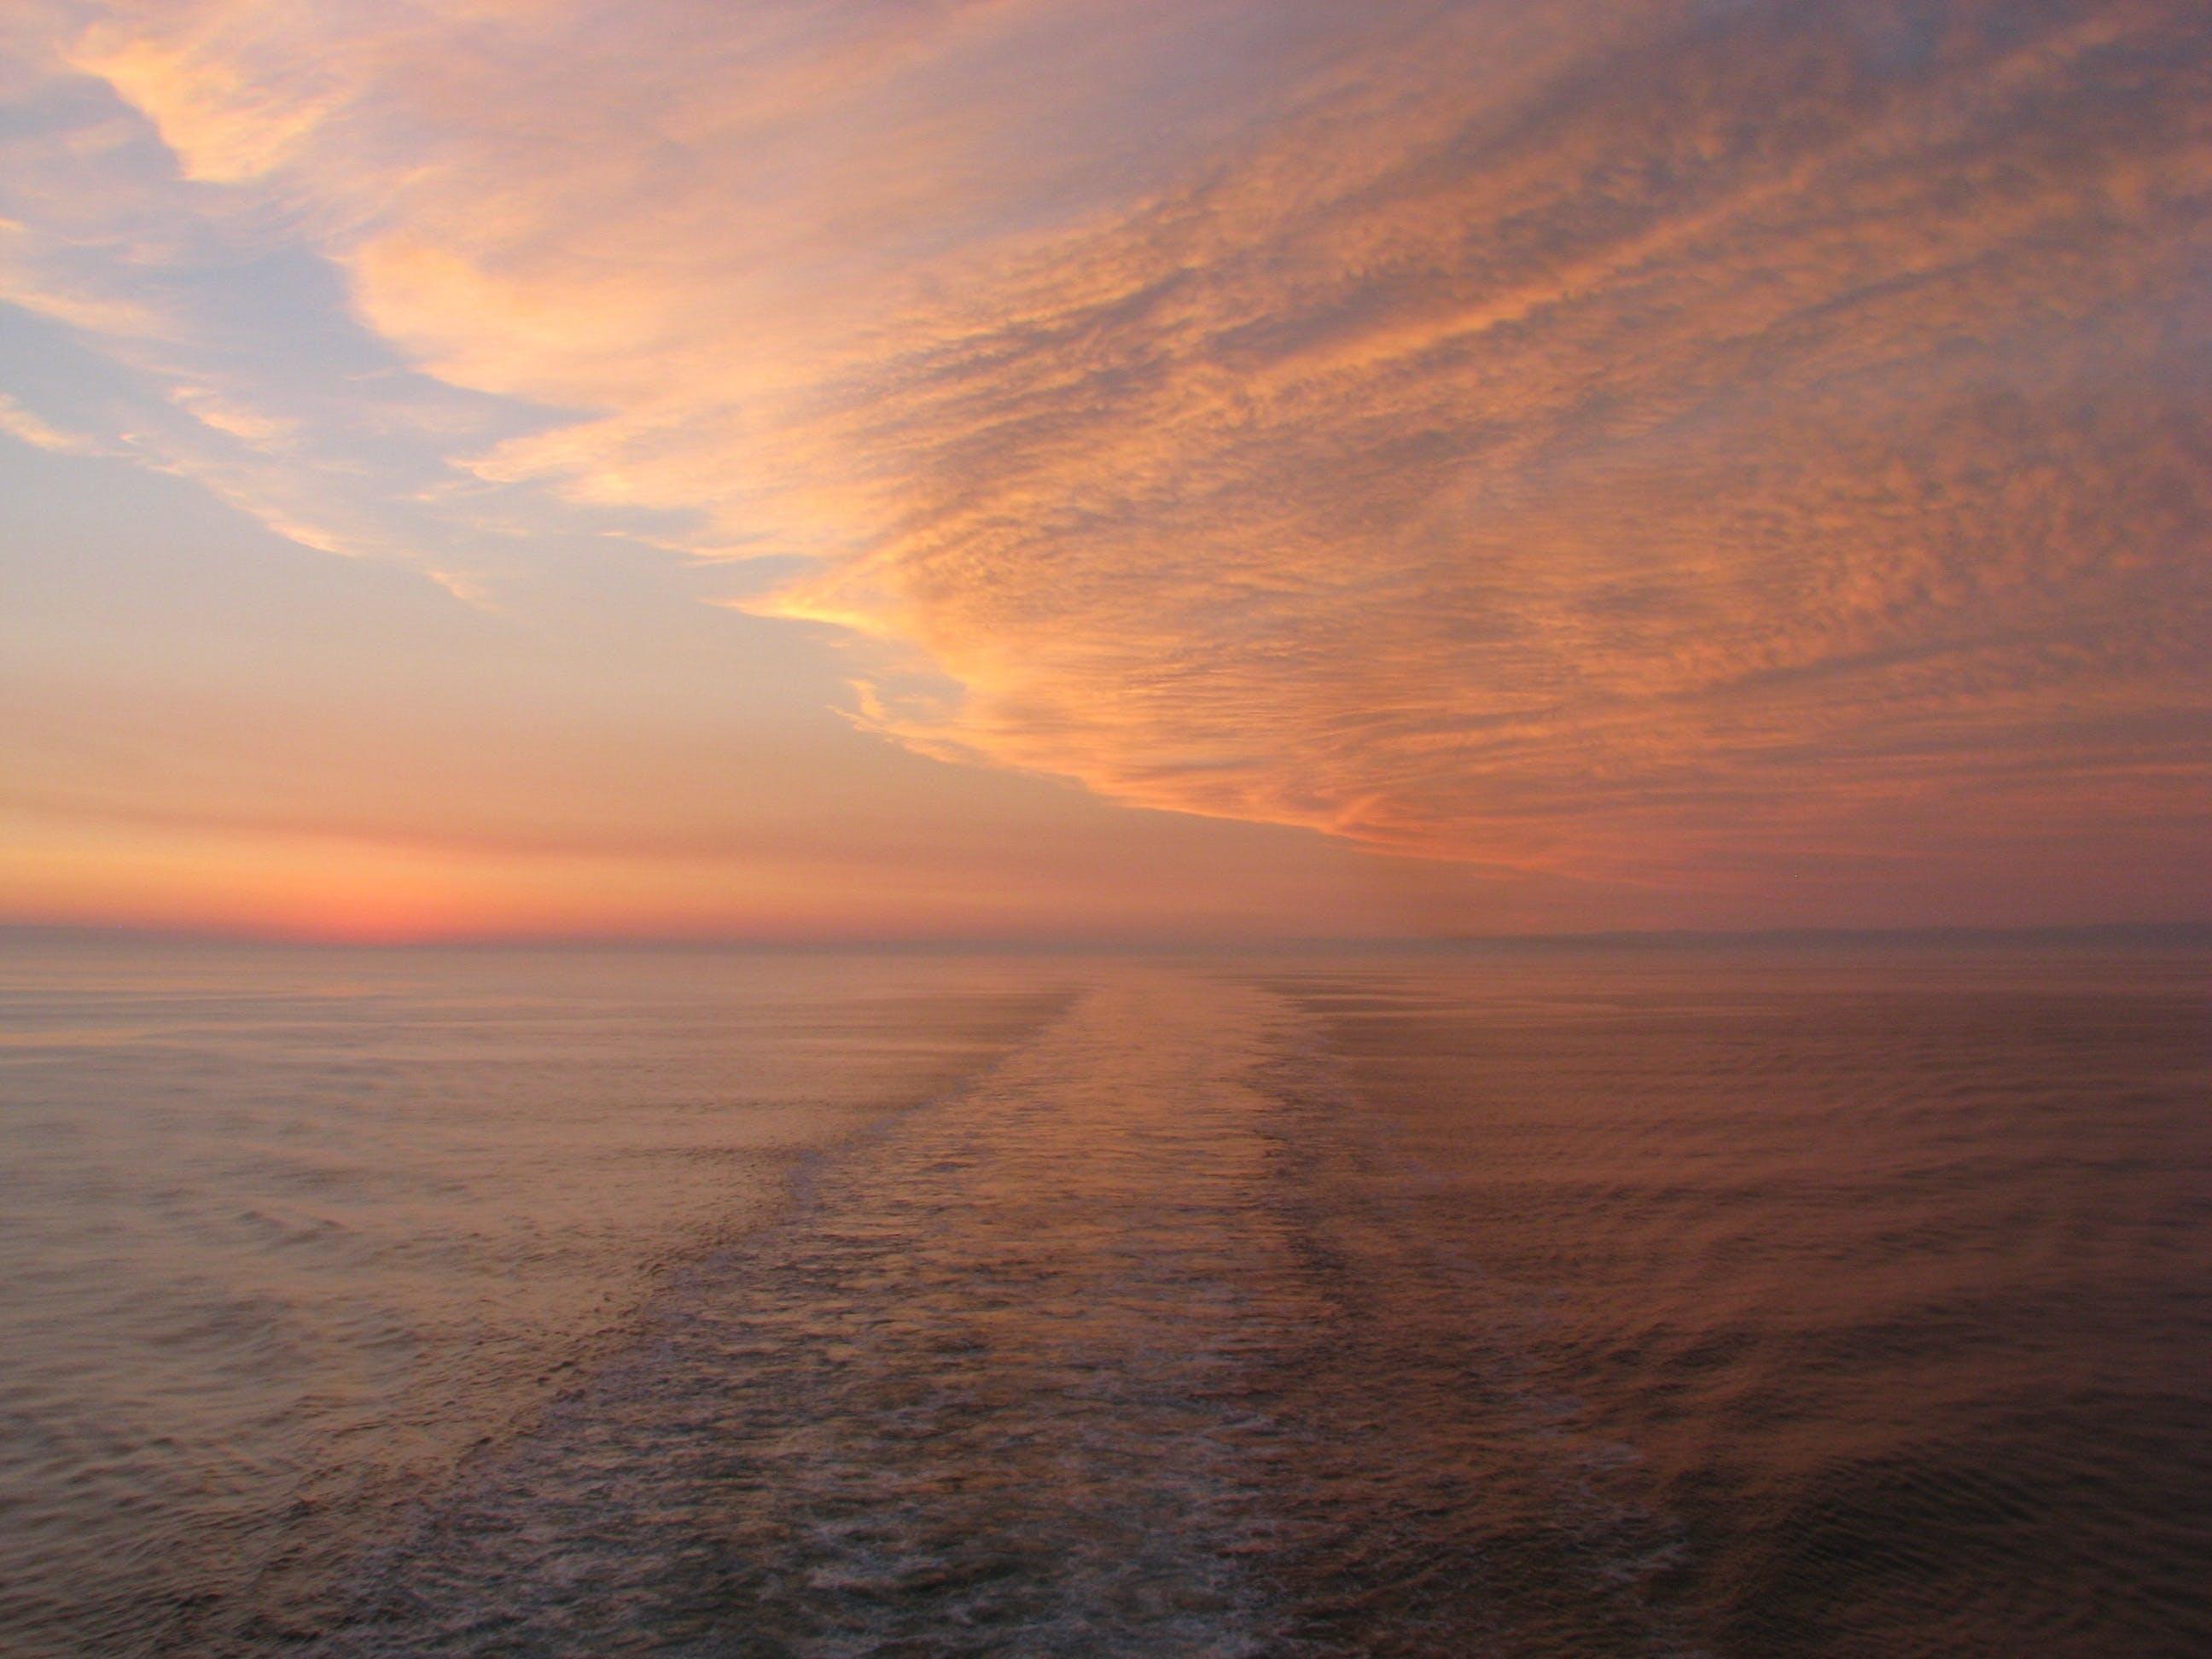 calm, clouds, horizon